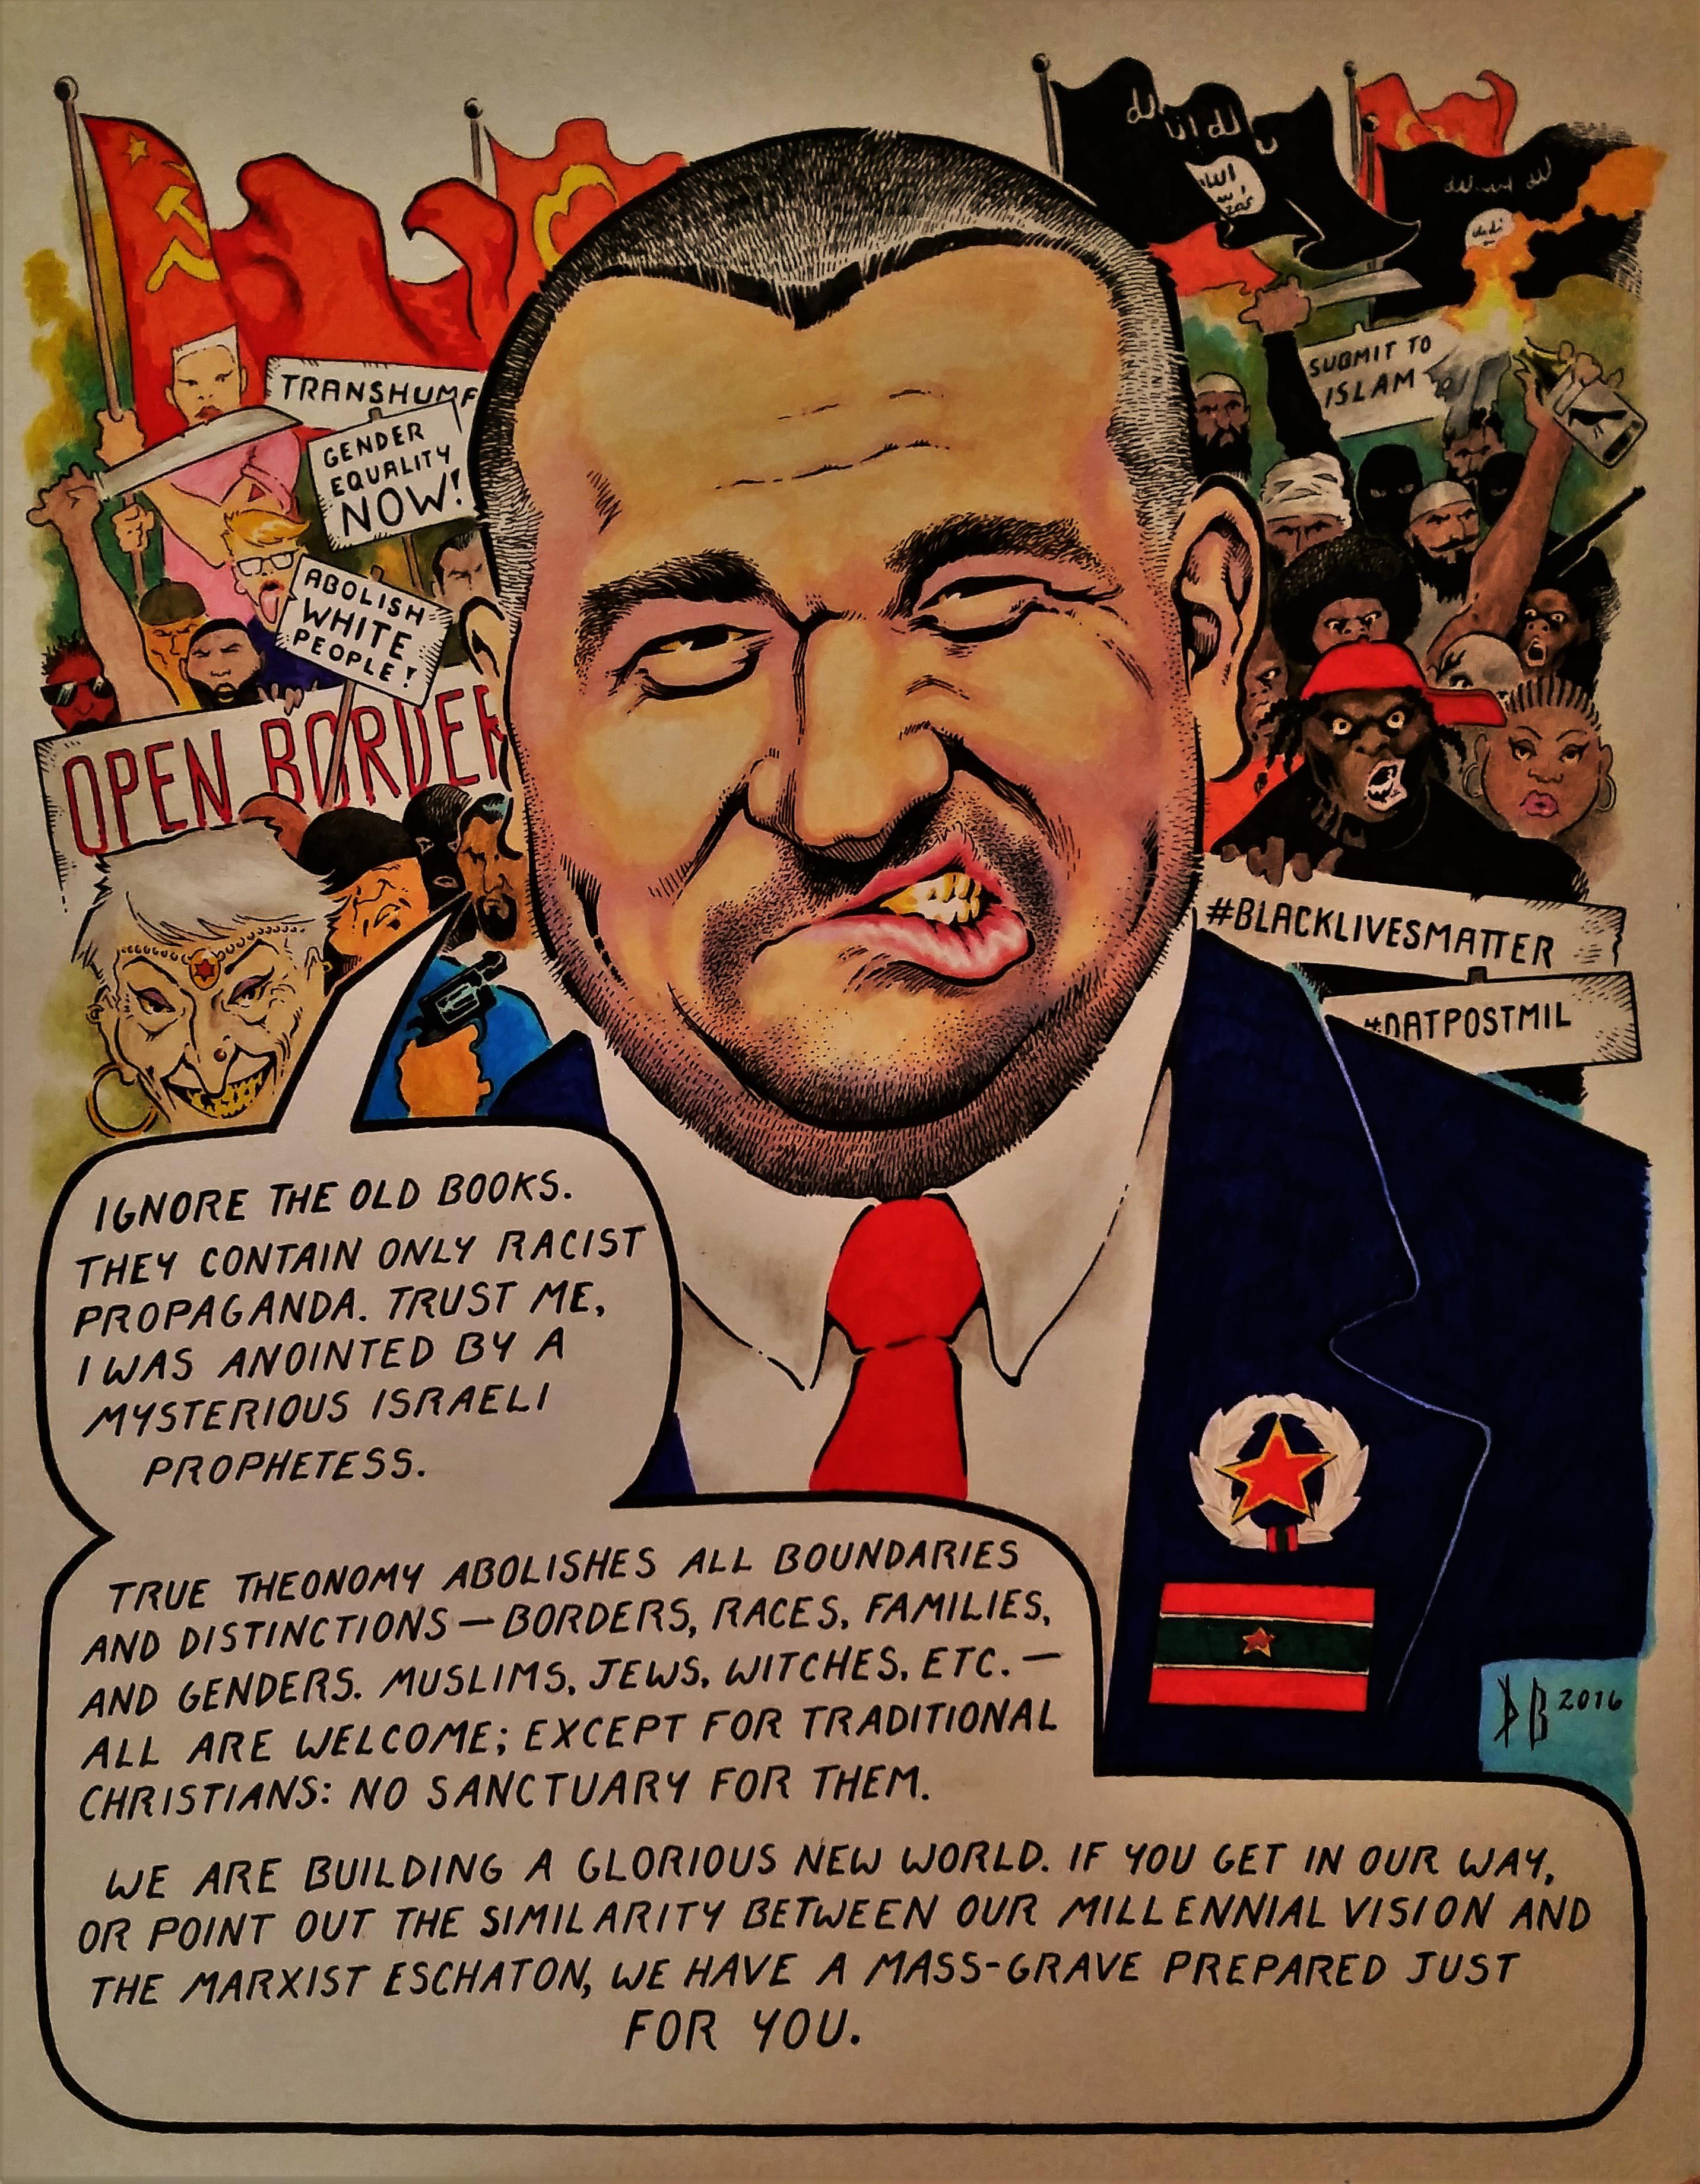 Bojidar-Marinov-cultural-Marxism-open-borders-#BlackLivesMatter-prophetess-racism-theonomy-postmillennialism-Bulgarian-continuationism-cessationism-feminism